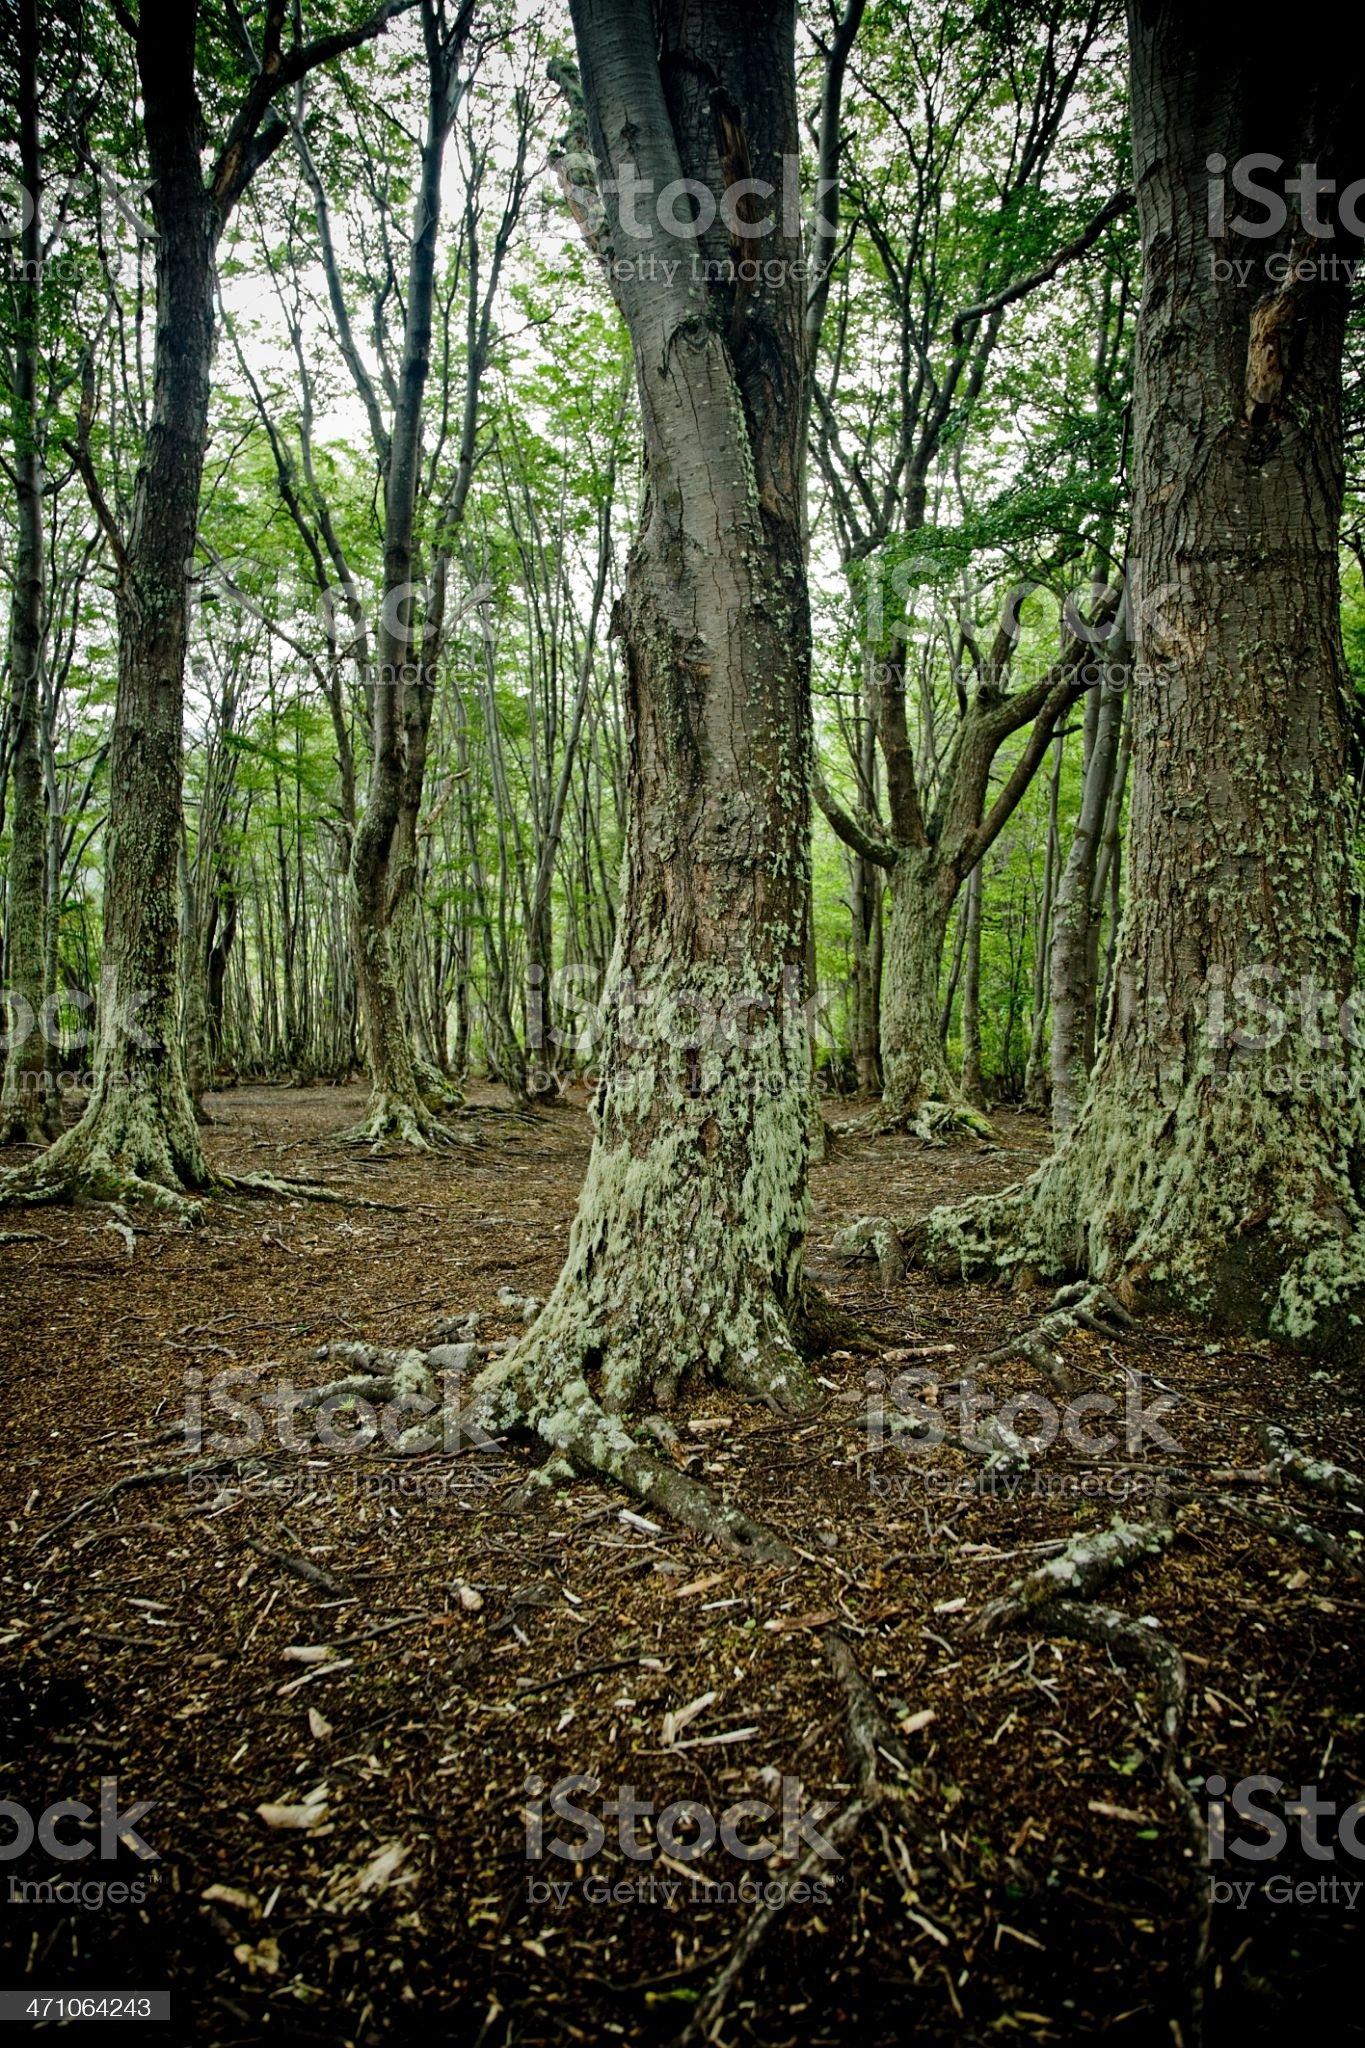 Forest Ushuaia Argentina Tierra del Fuego royalty-free stock photo